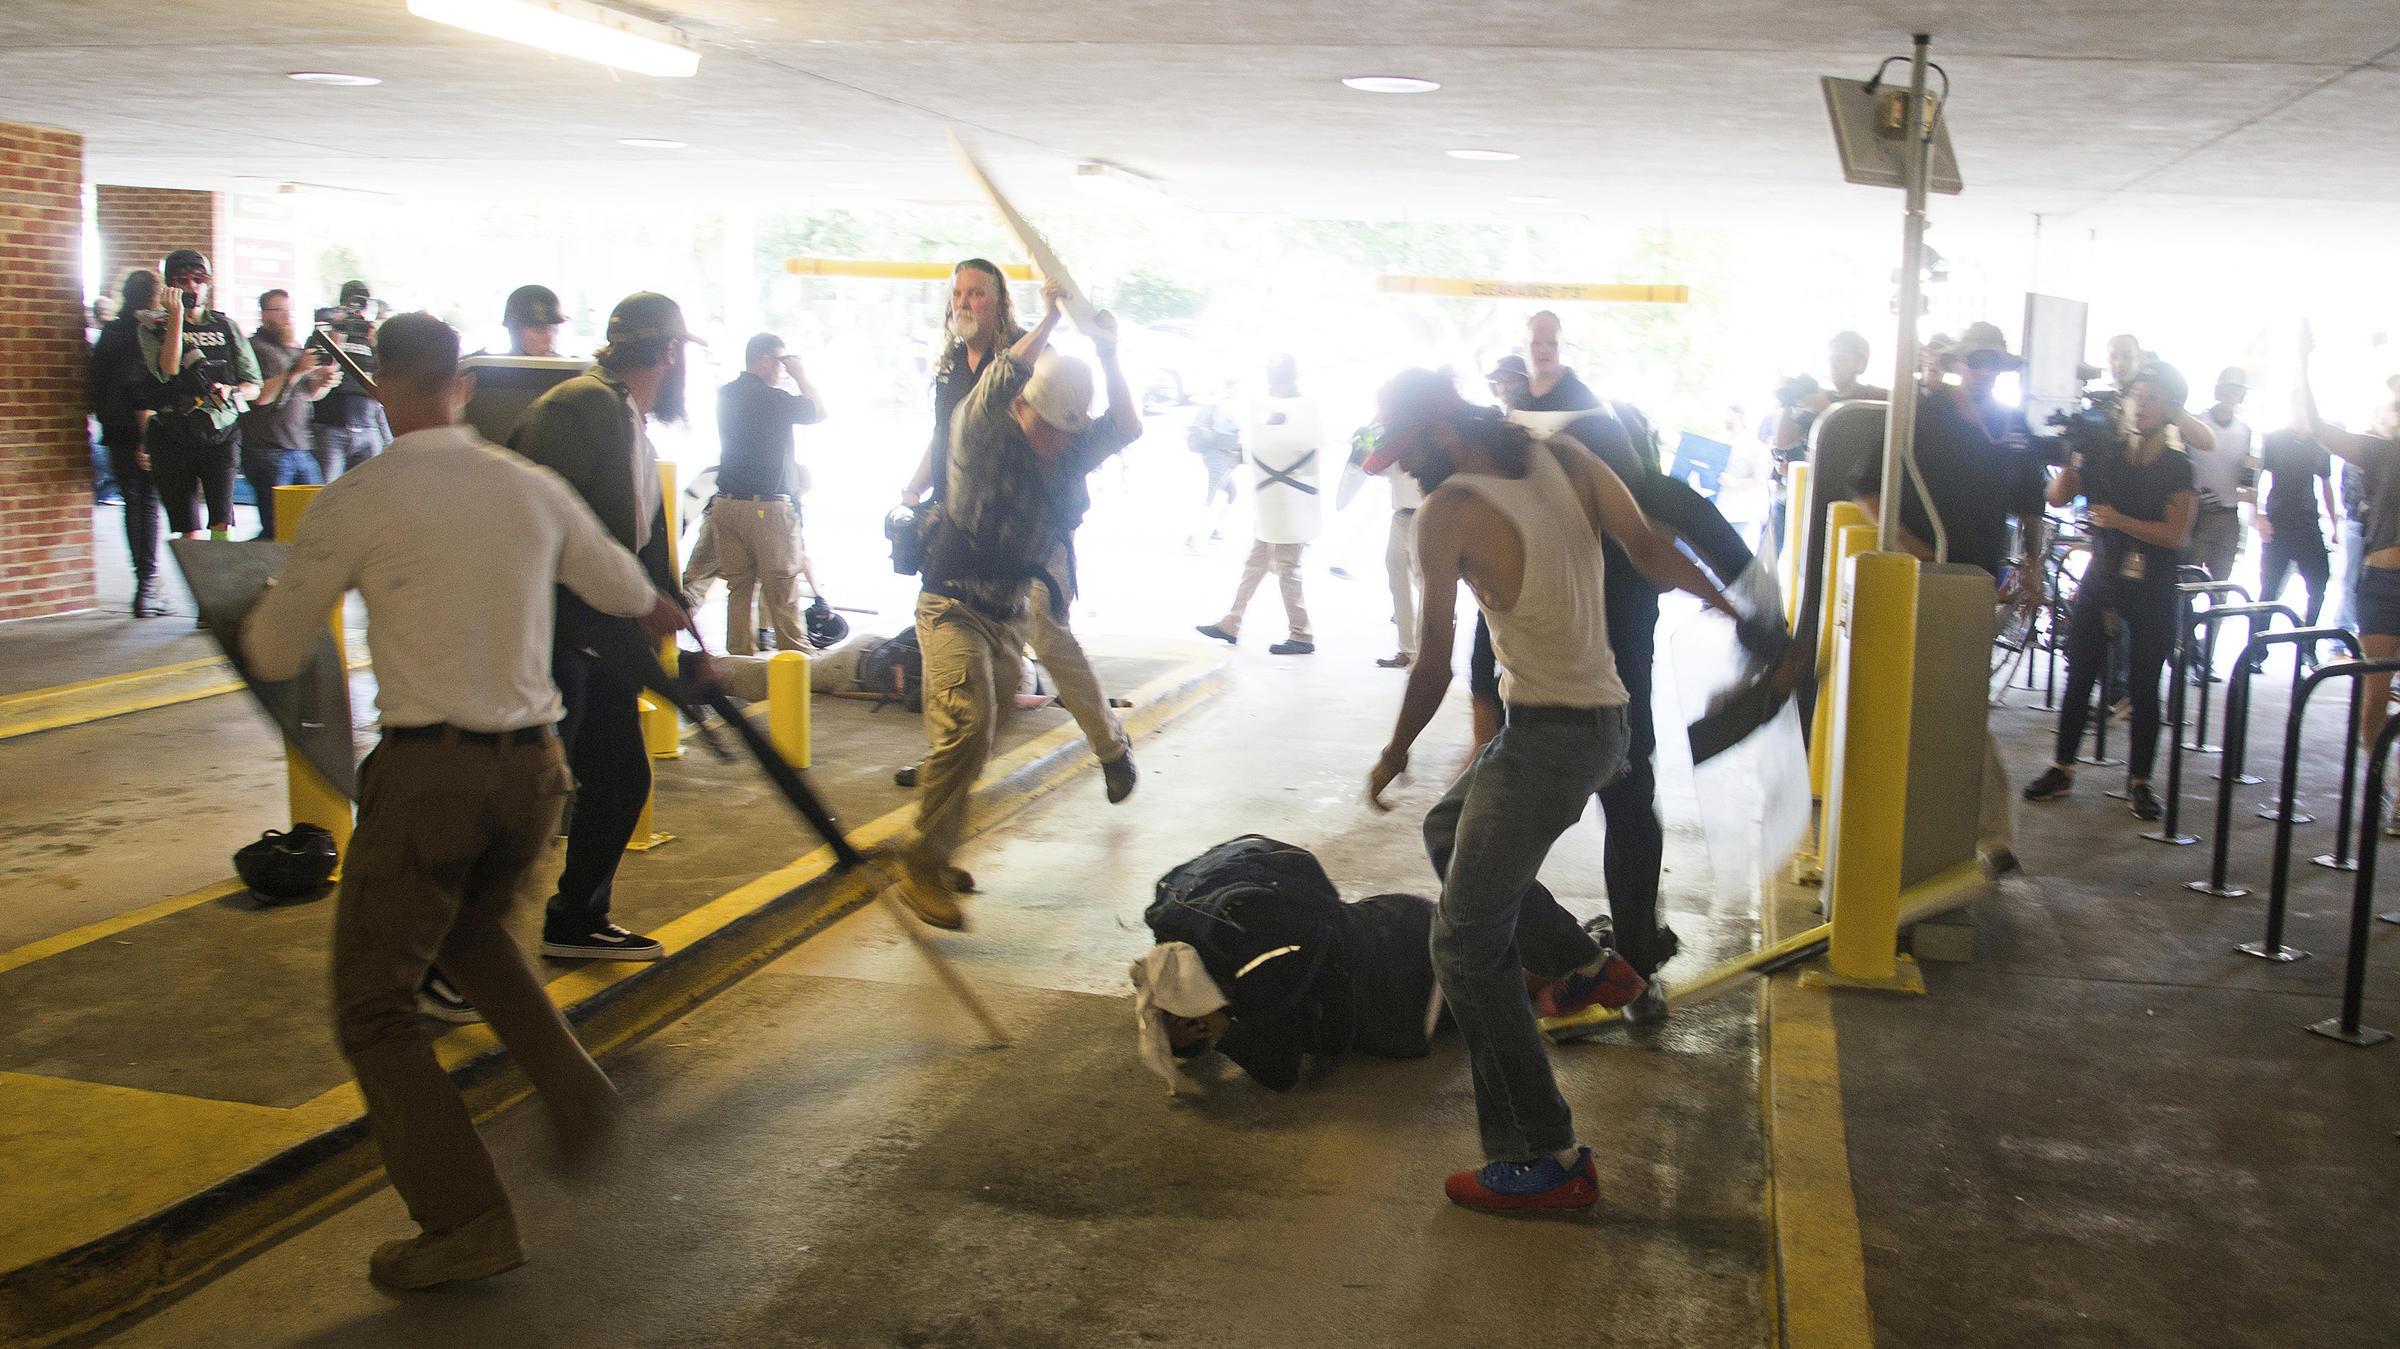 Black man beaten at Charlottesville rally 'cleared of assault'